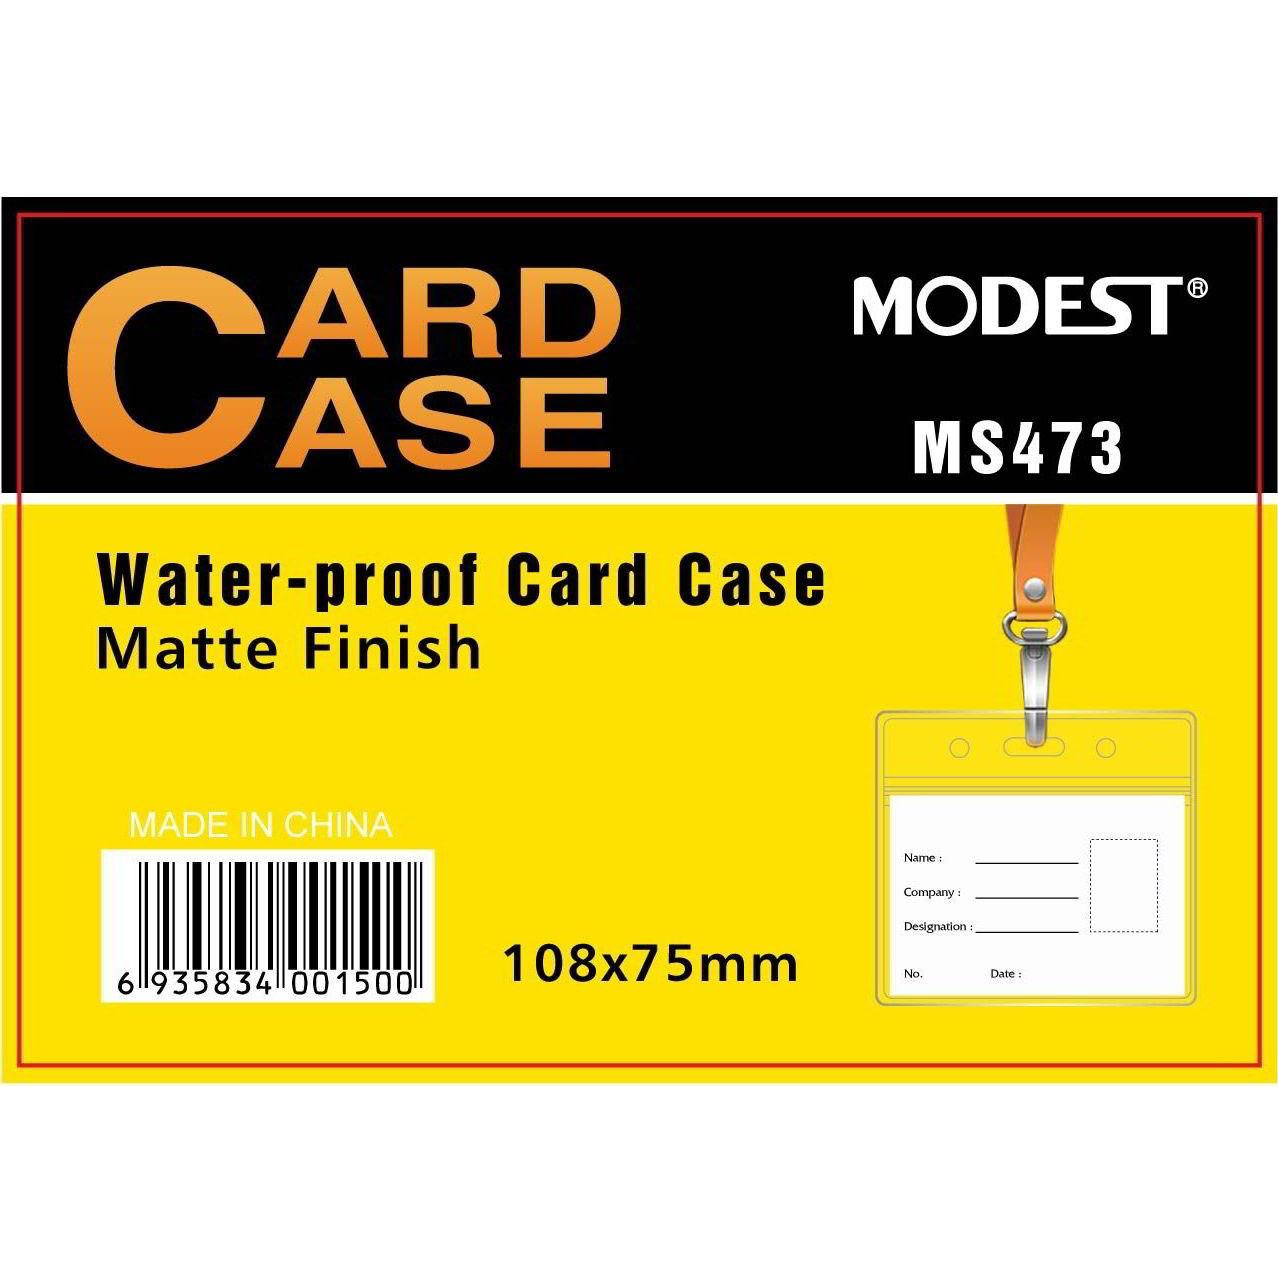 Modest MS-473 Matte Finish Horizontal Card Case without Lanyard - 108 x 75mm (pkt/10pcs)